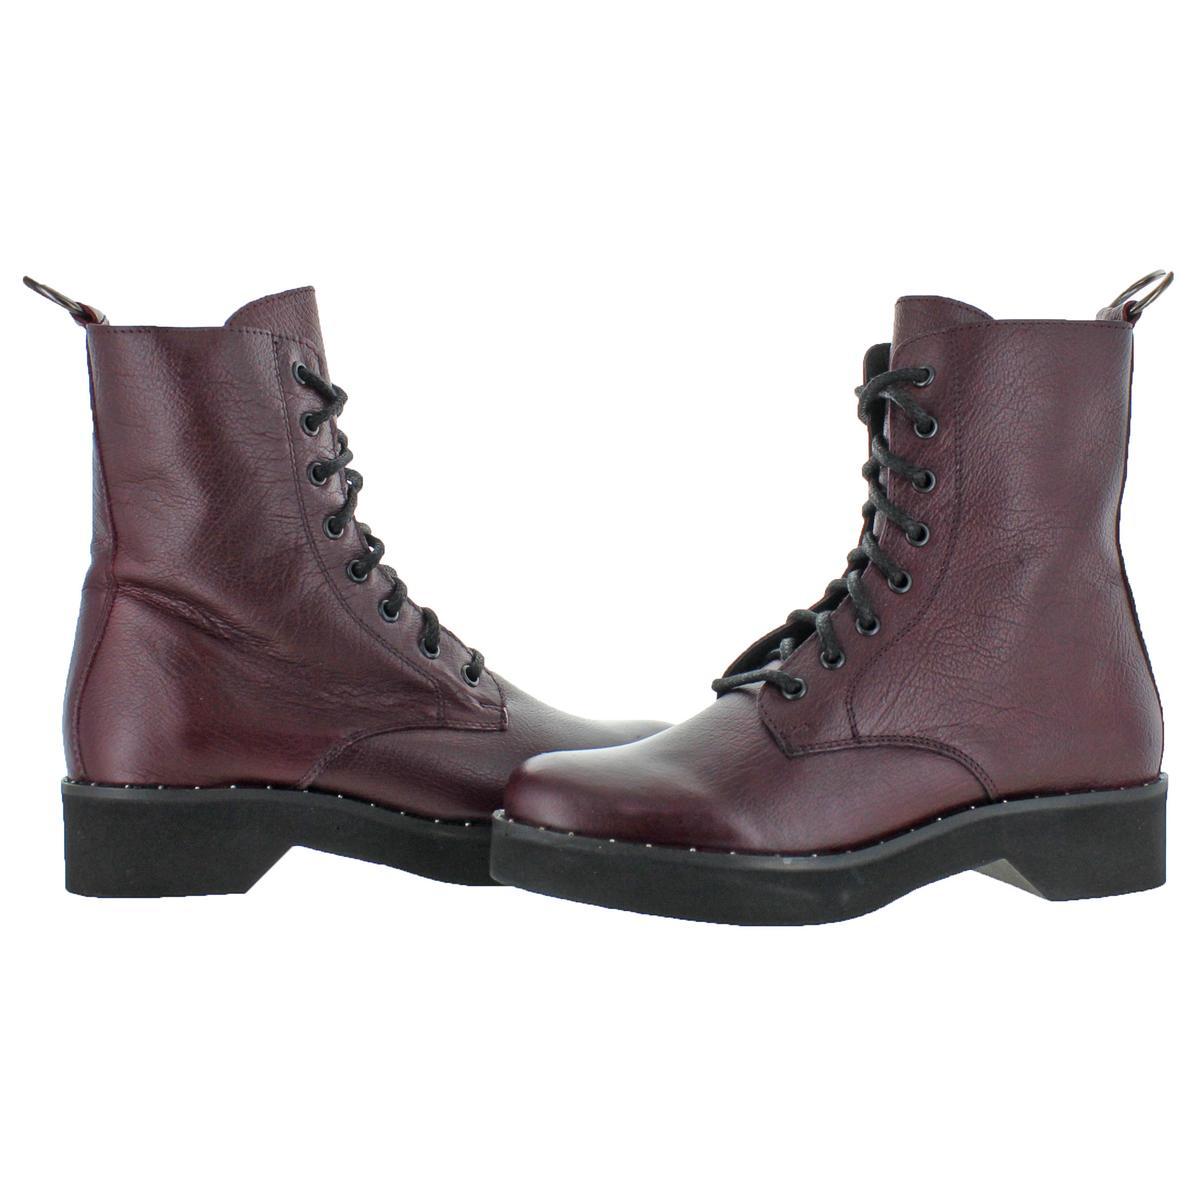 b95549e6d7c Details about Steve Madden Womens Rocco Red Combat Boots Shoes 7.5 Medium  (B